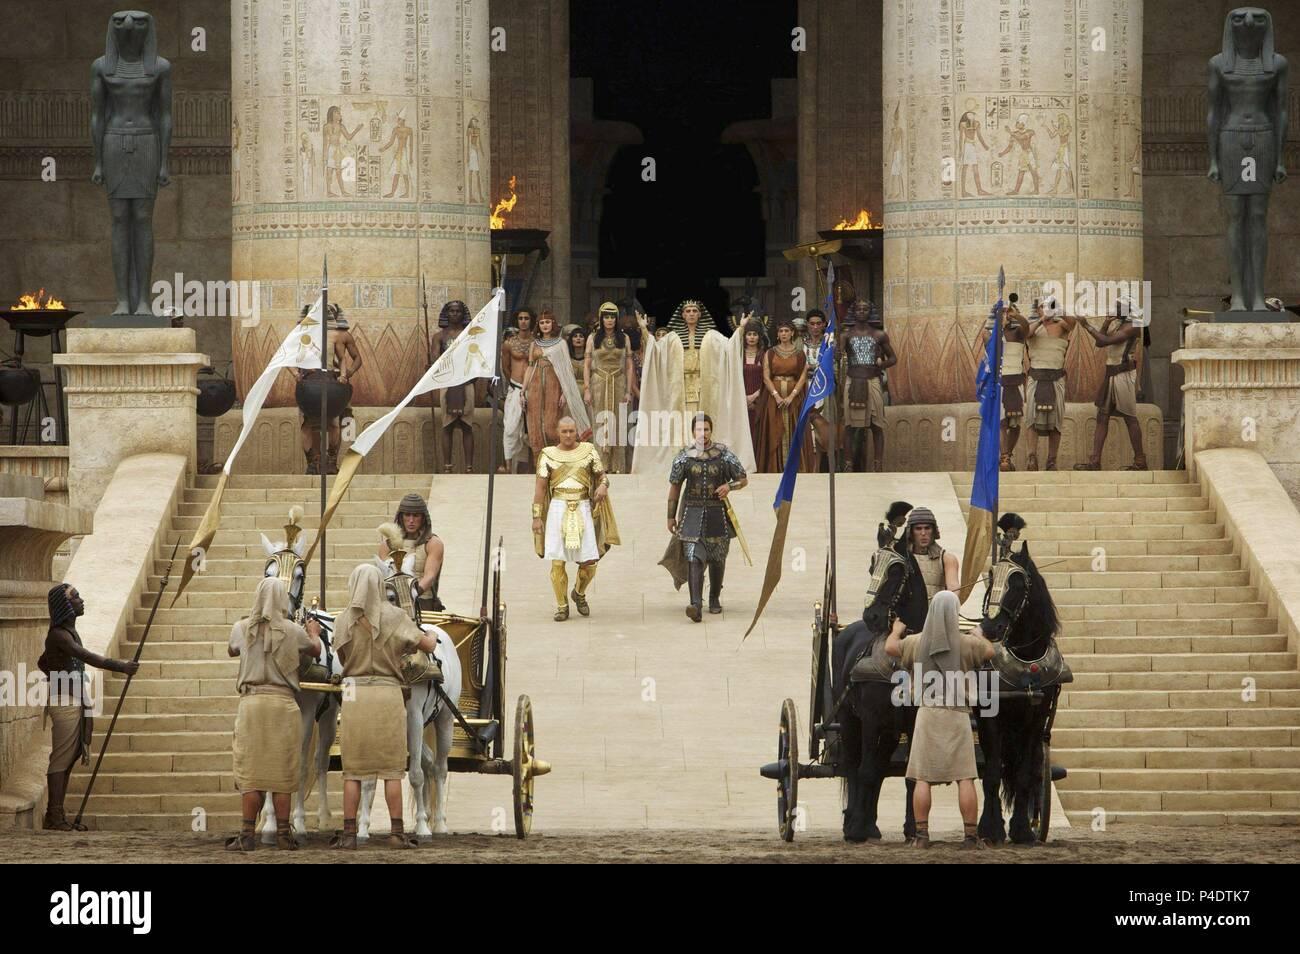 Original Film Title: EXODUS: GODS AND KINGS.  English Title: EXODUS: GODS AND KINGS.  Film Director: RIDLEY SCOTT.  Year: 2014. Credit: CHERNIN ENTERTAINMENT / Album - Stock Image